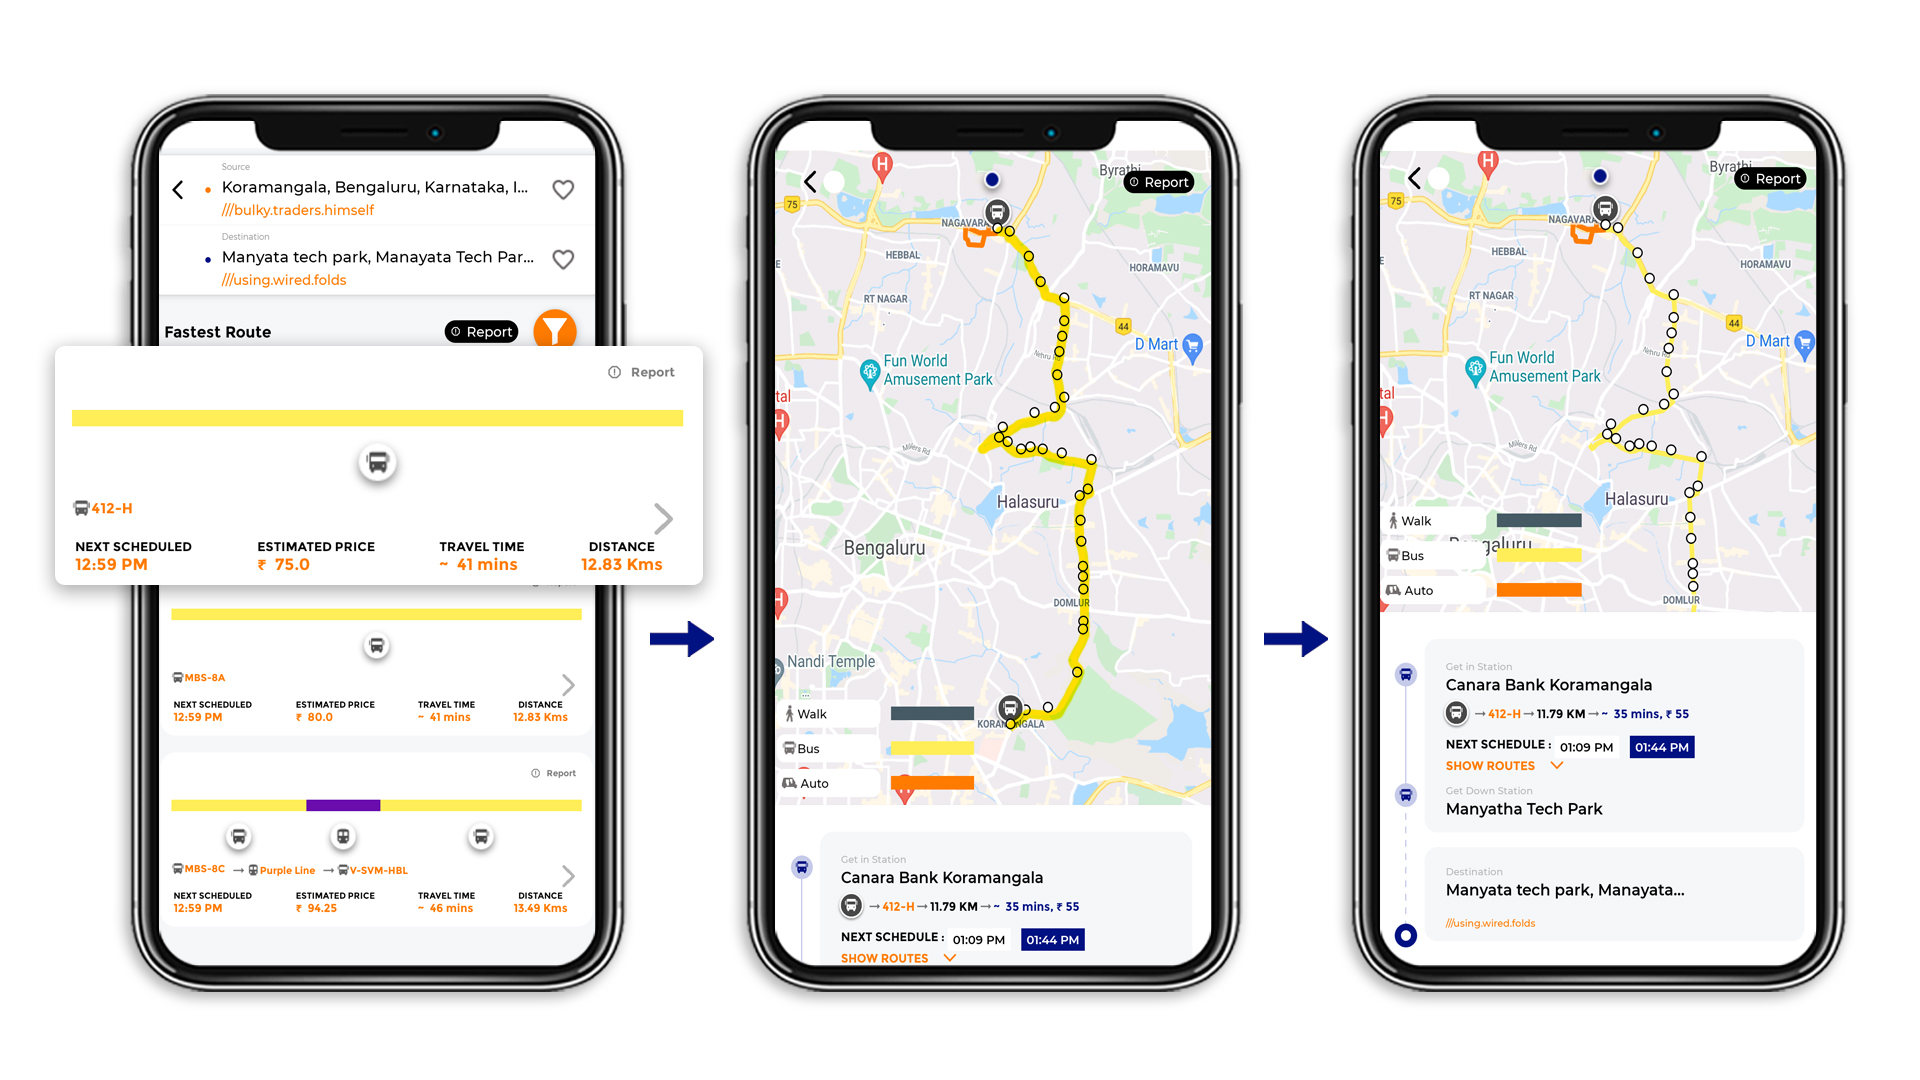 Tummoc, Tummoc app, Kormangala, Manyata Tech park, Public transport